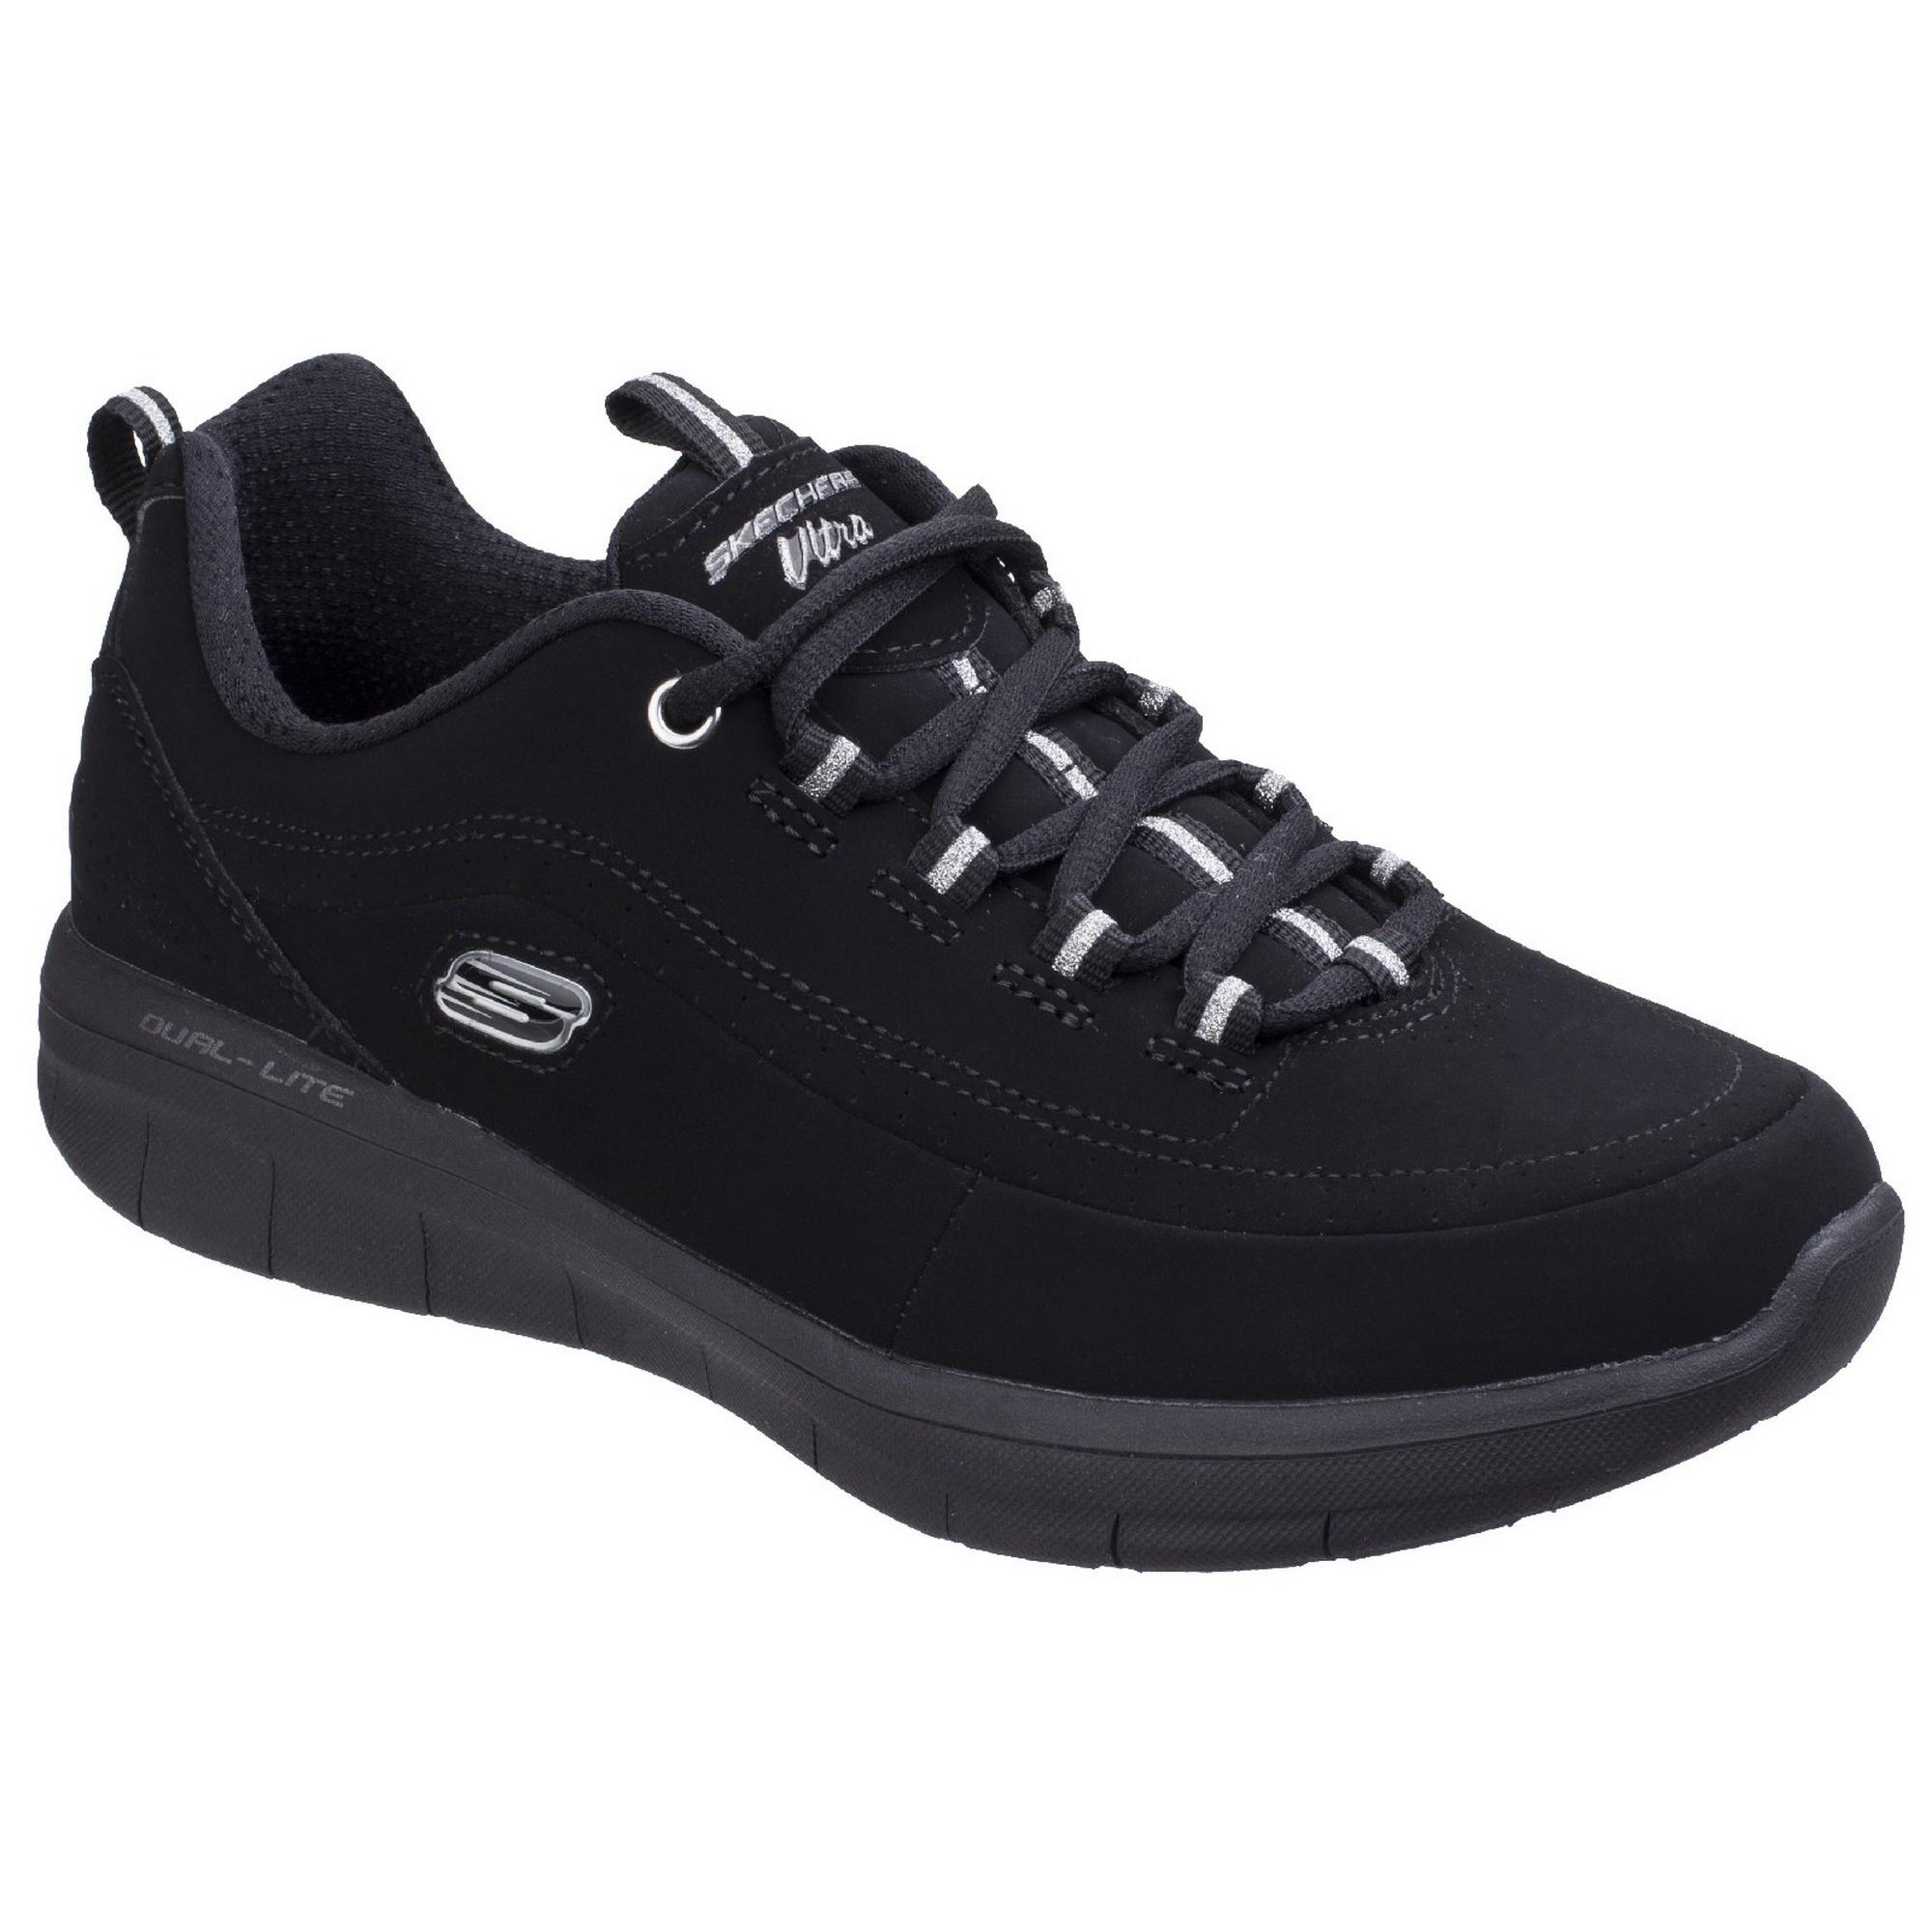 Skechers - Zapatillas deportivas modelo Synergy 2.0 para mujer (FS4431)